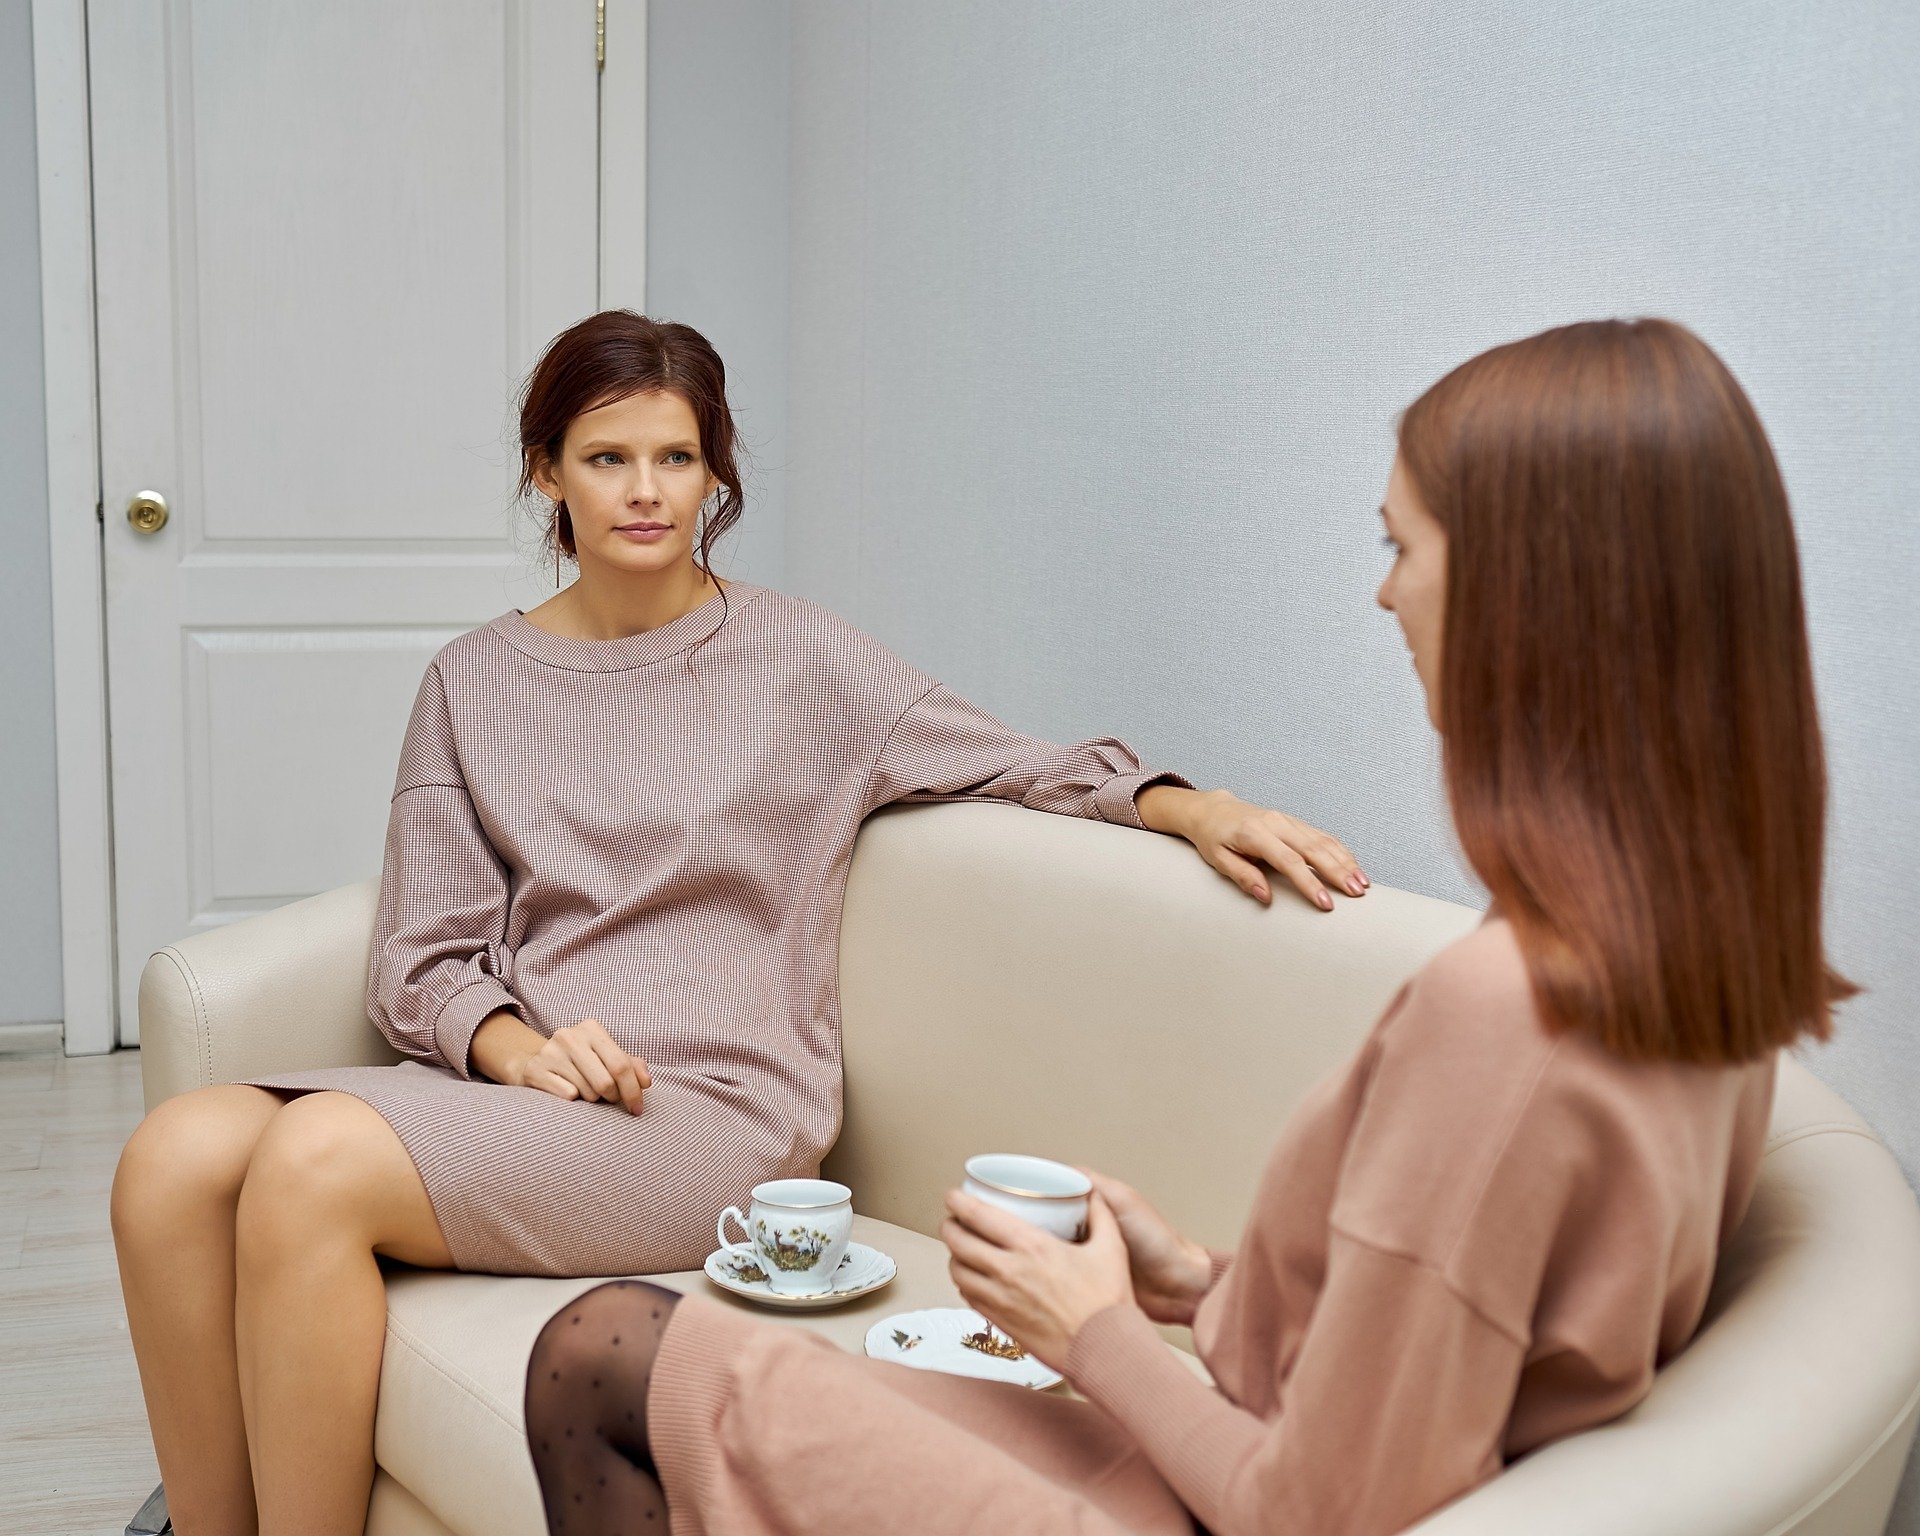 psychologist-6008046_1920